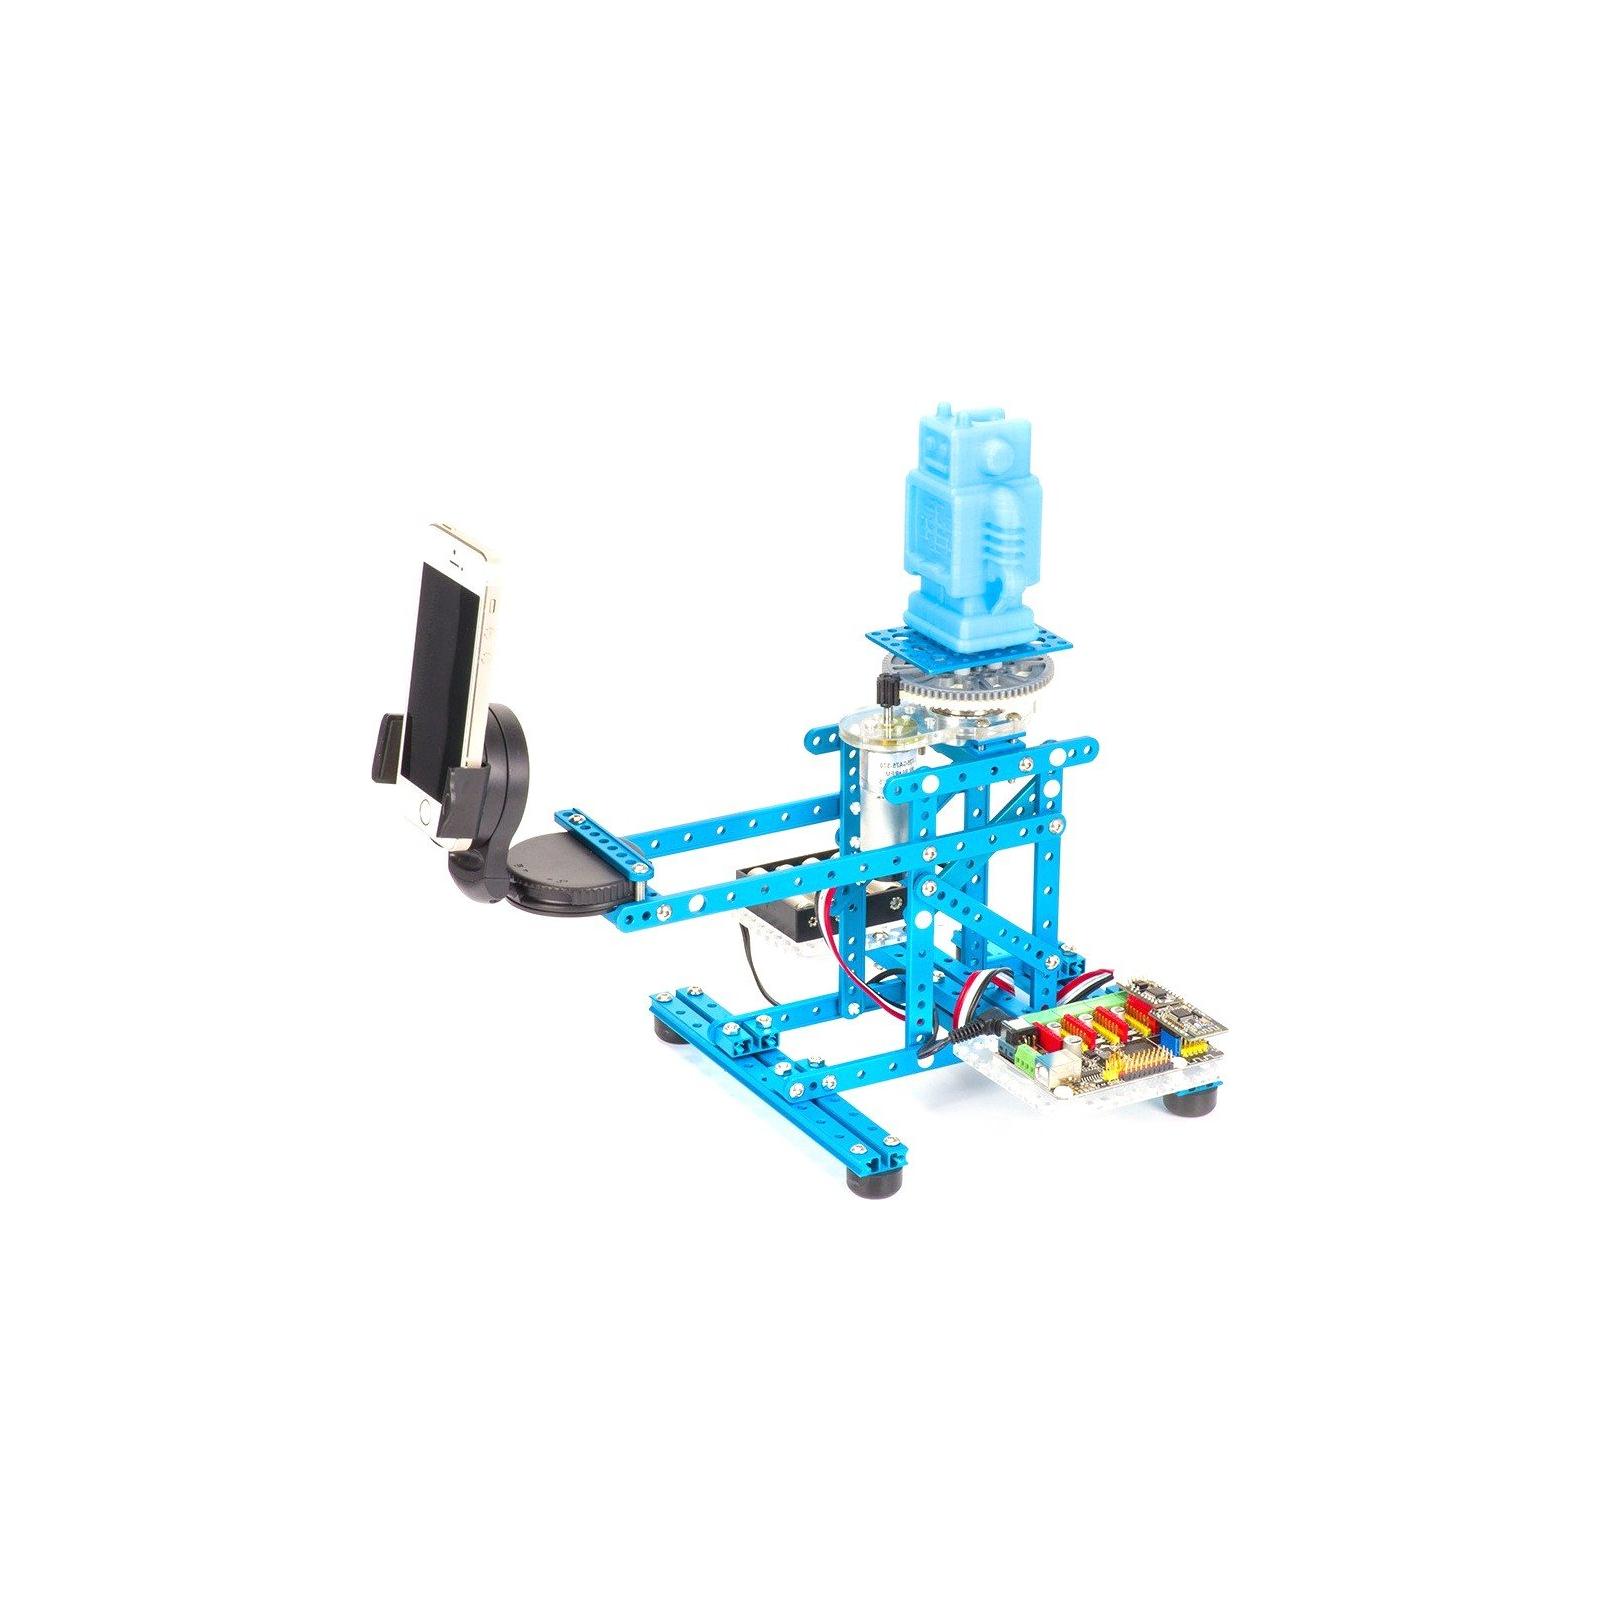 Робот Makeblock Ultimate v2.0 Robot Kit (09.00.40) изображение 9